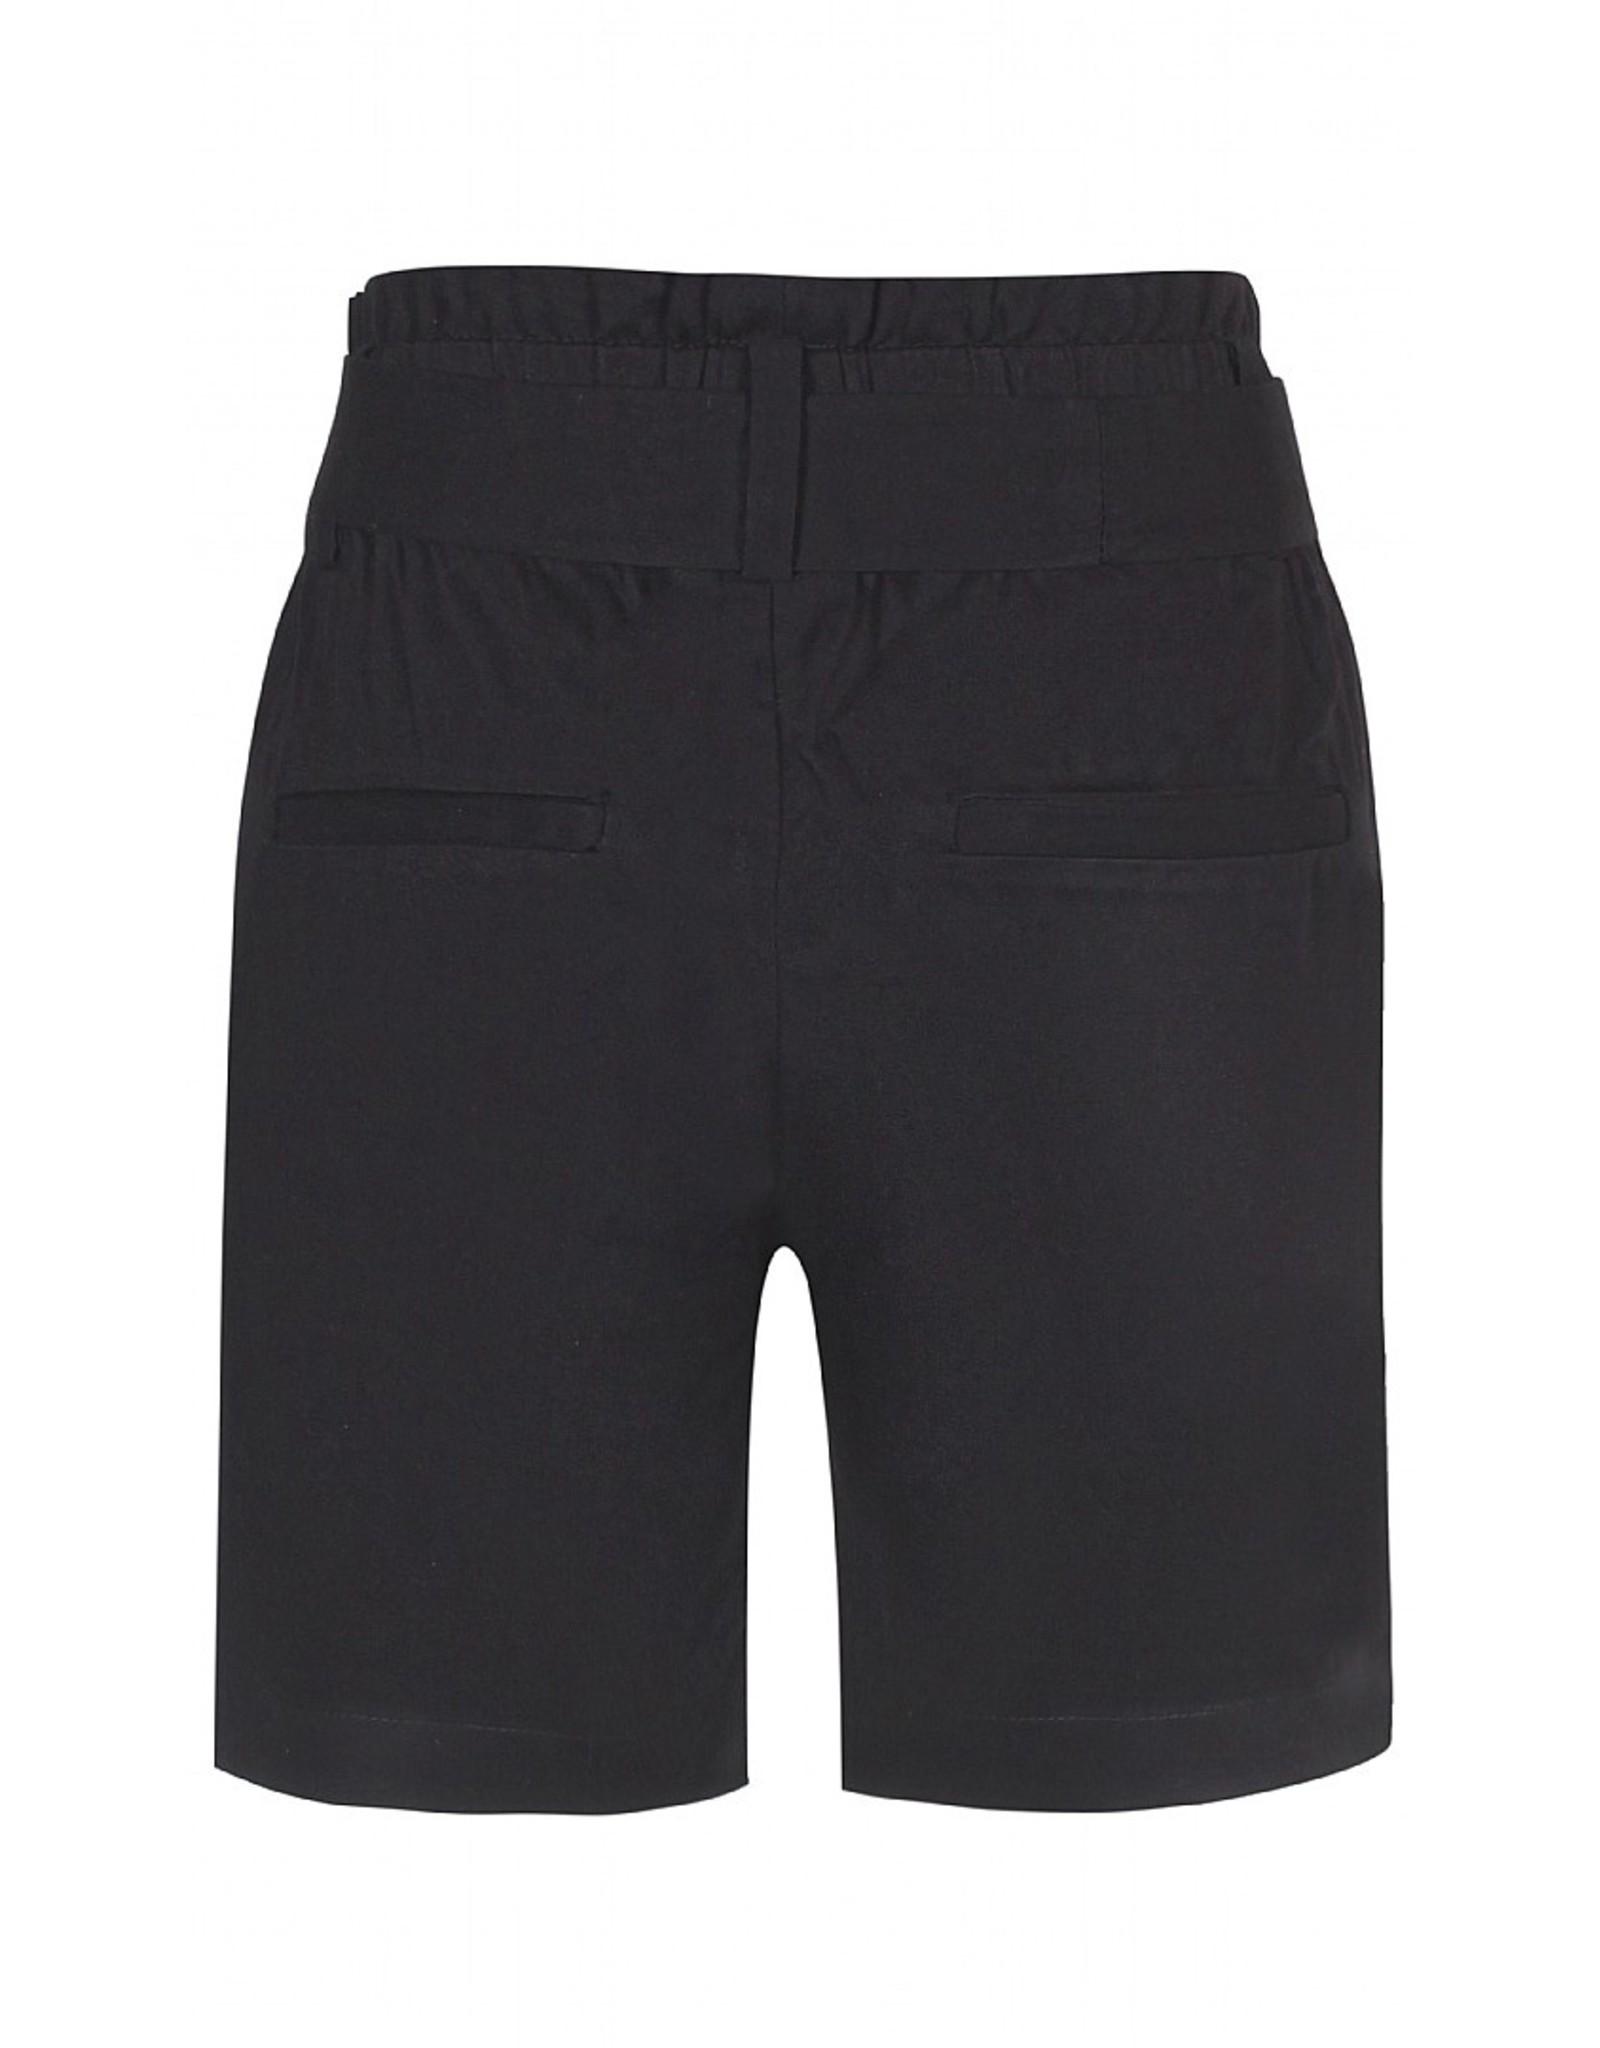 KIDS UP Kids Up Sola Shorts